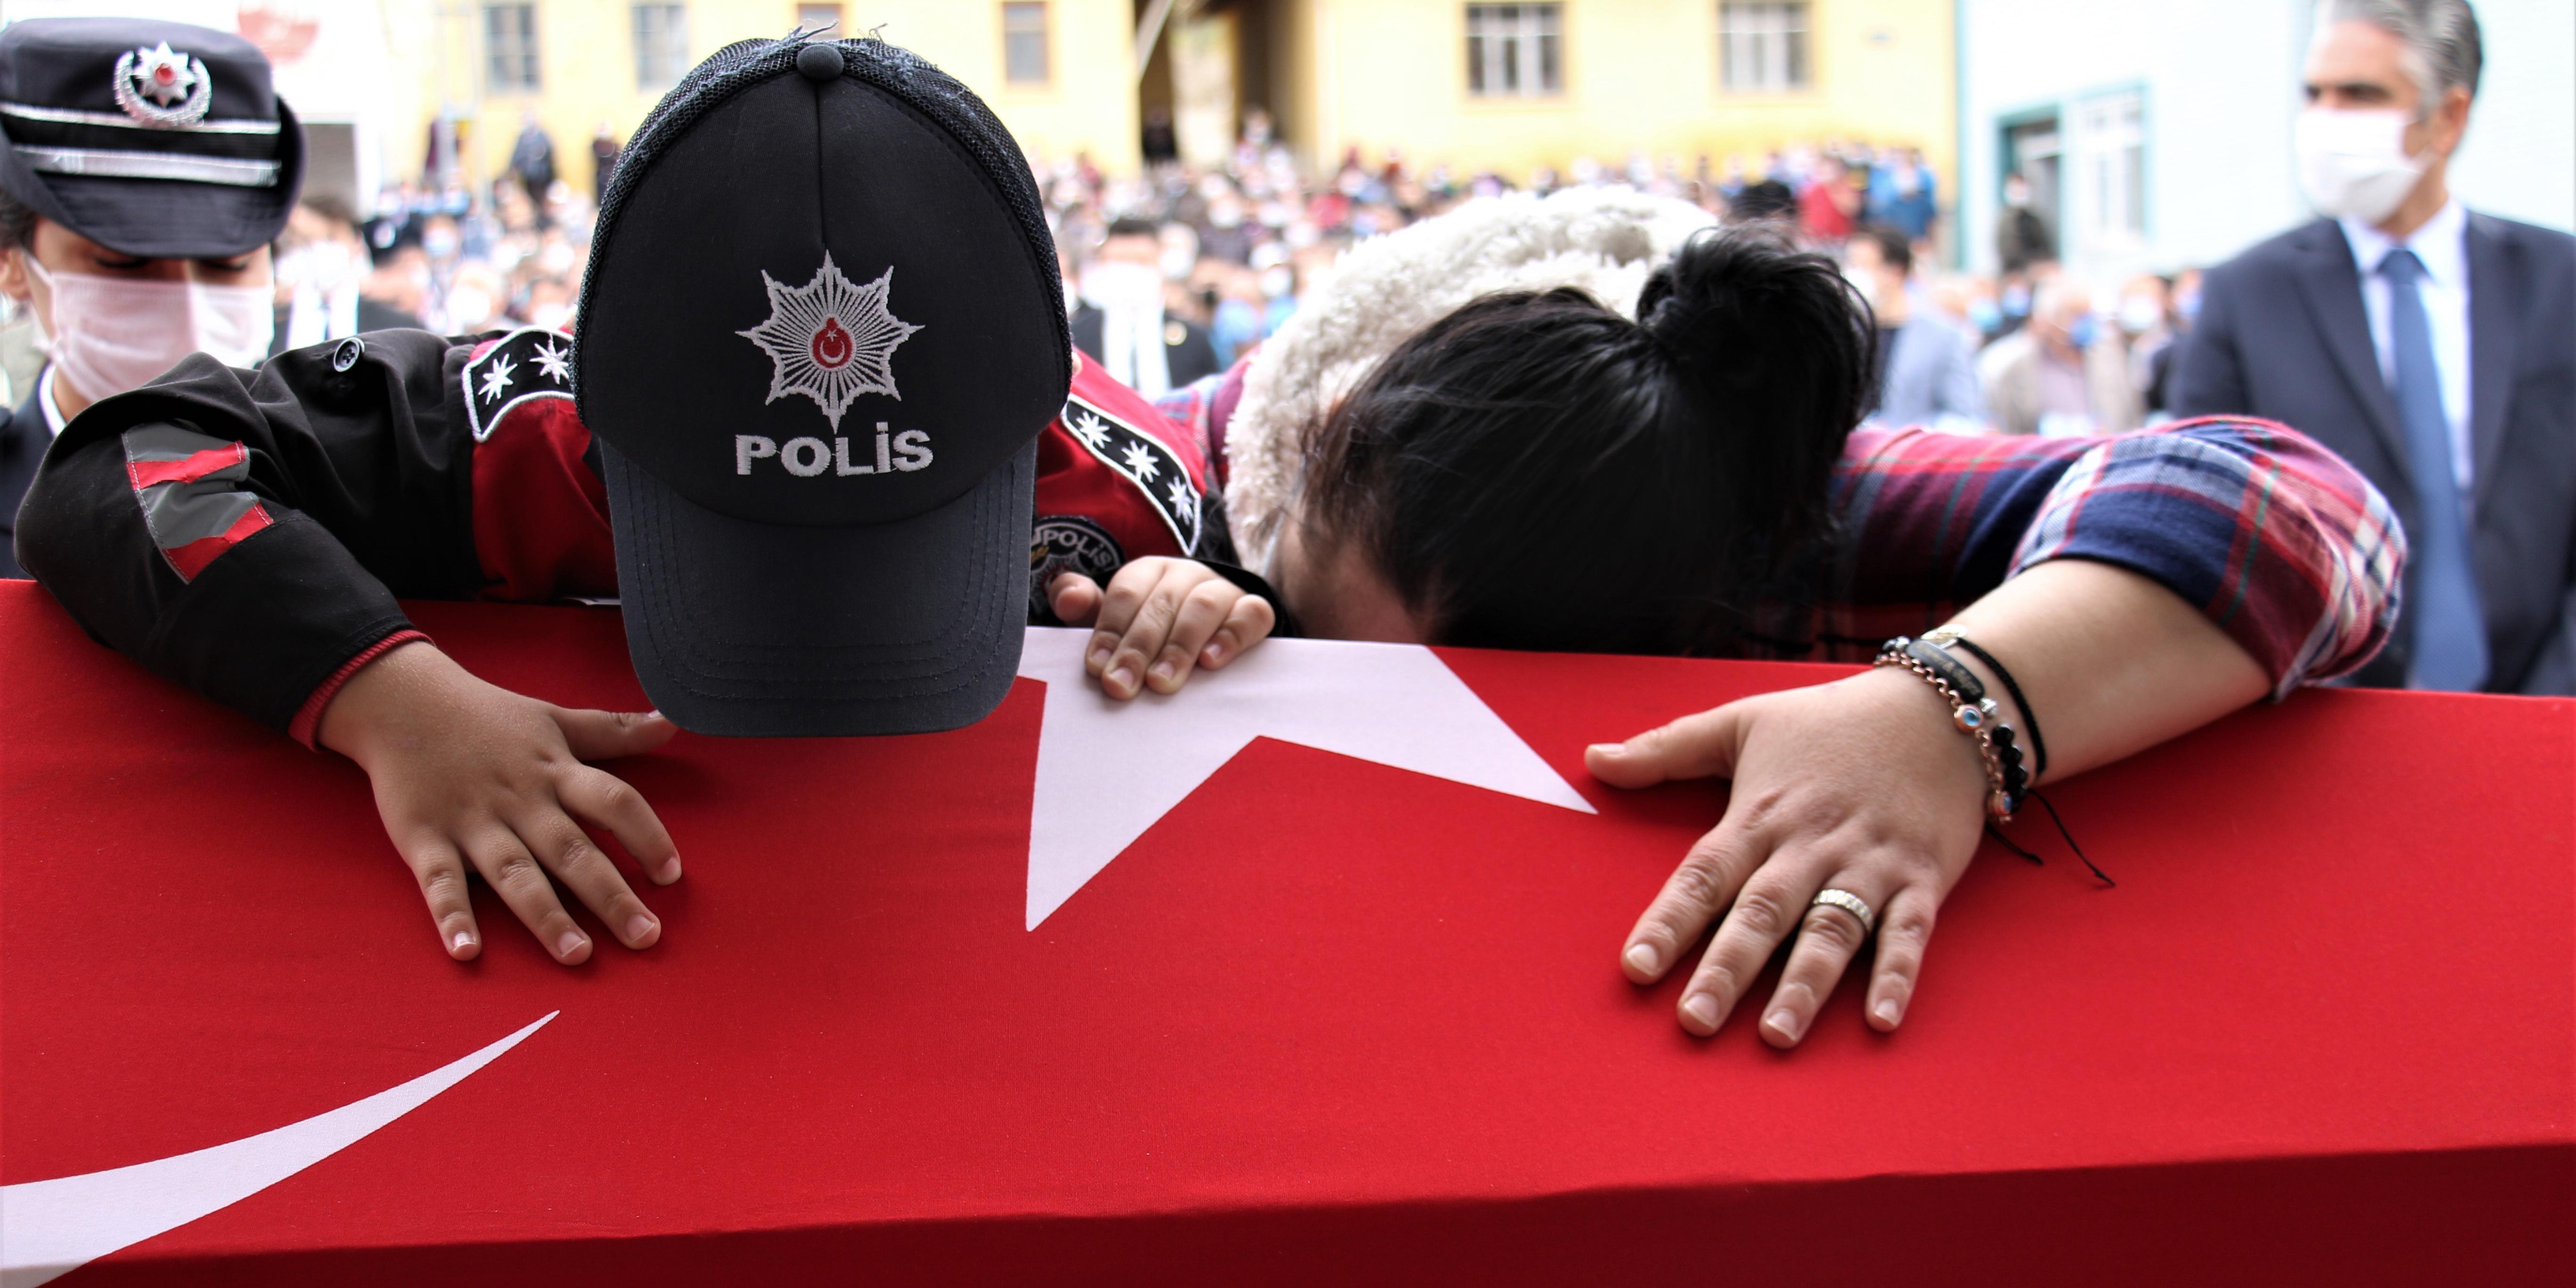 Şehit düşen polis memuru Ankara'da toprağa verildi